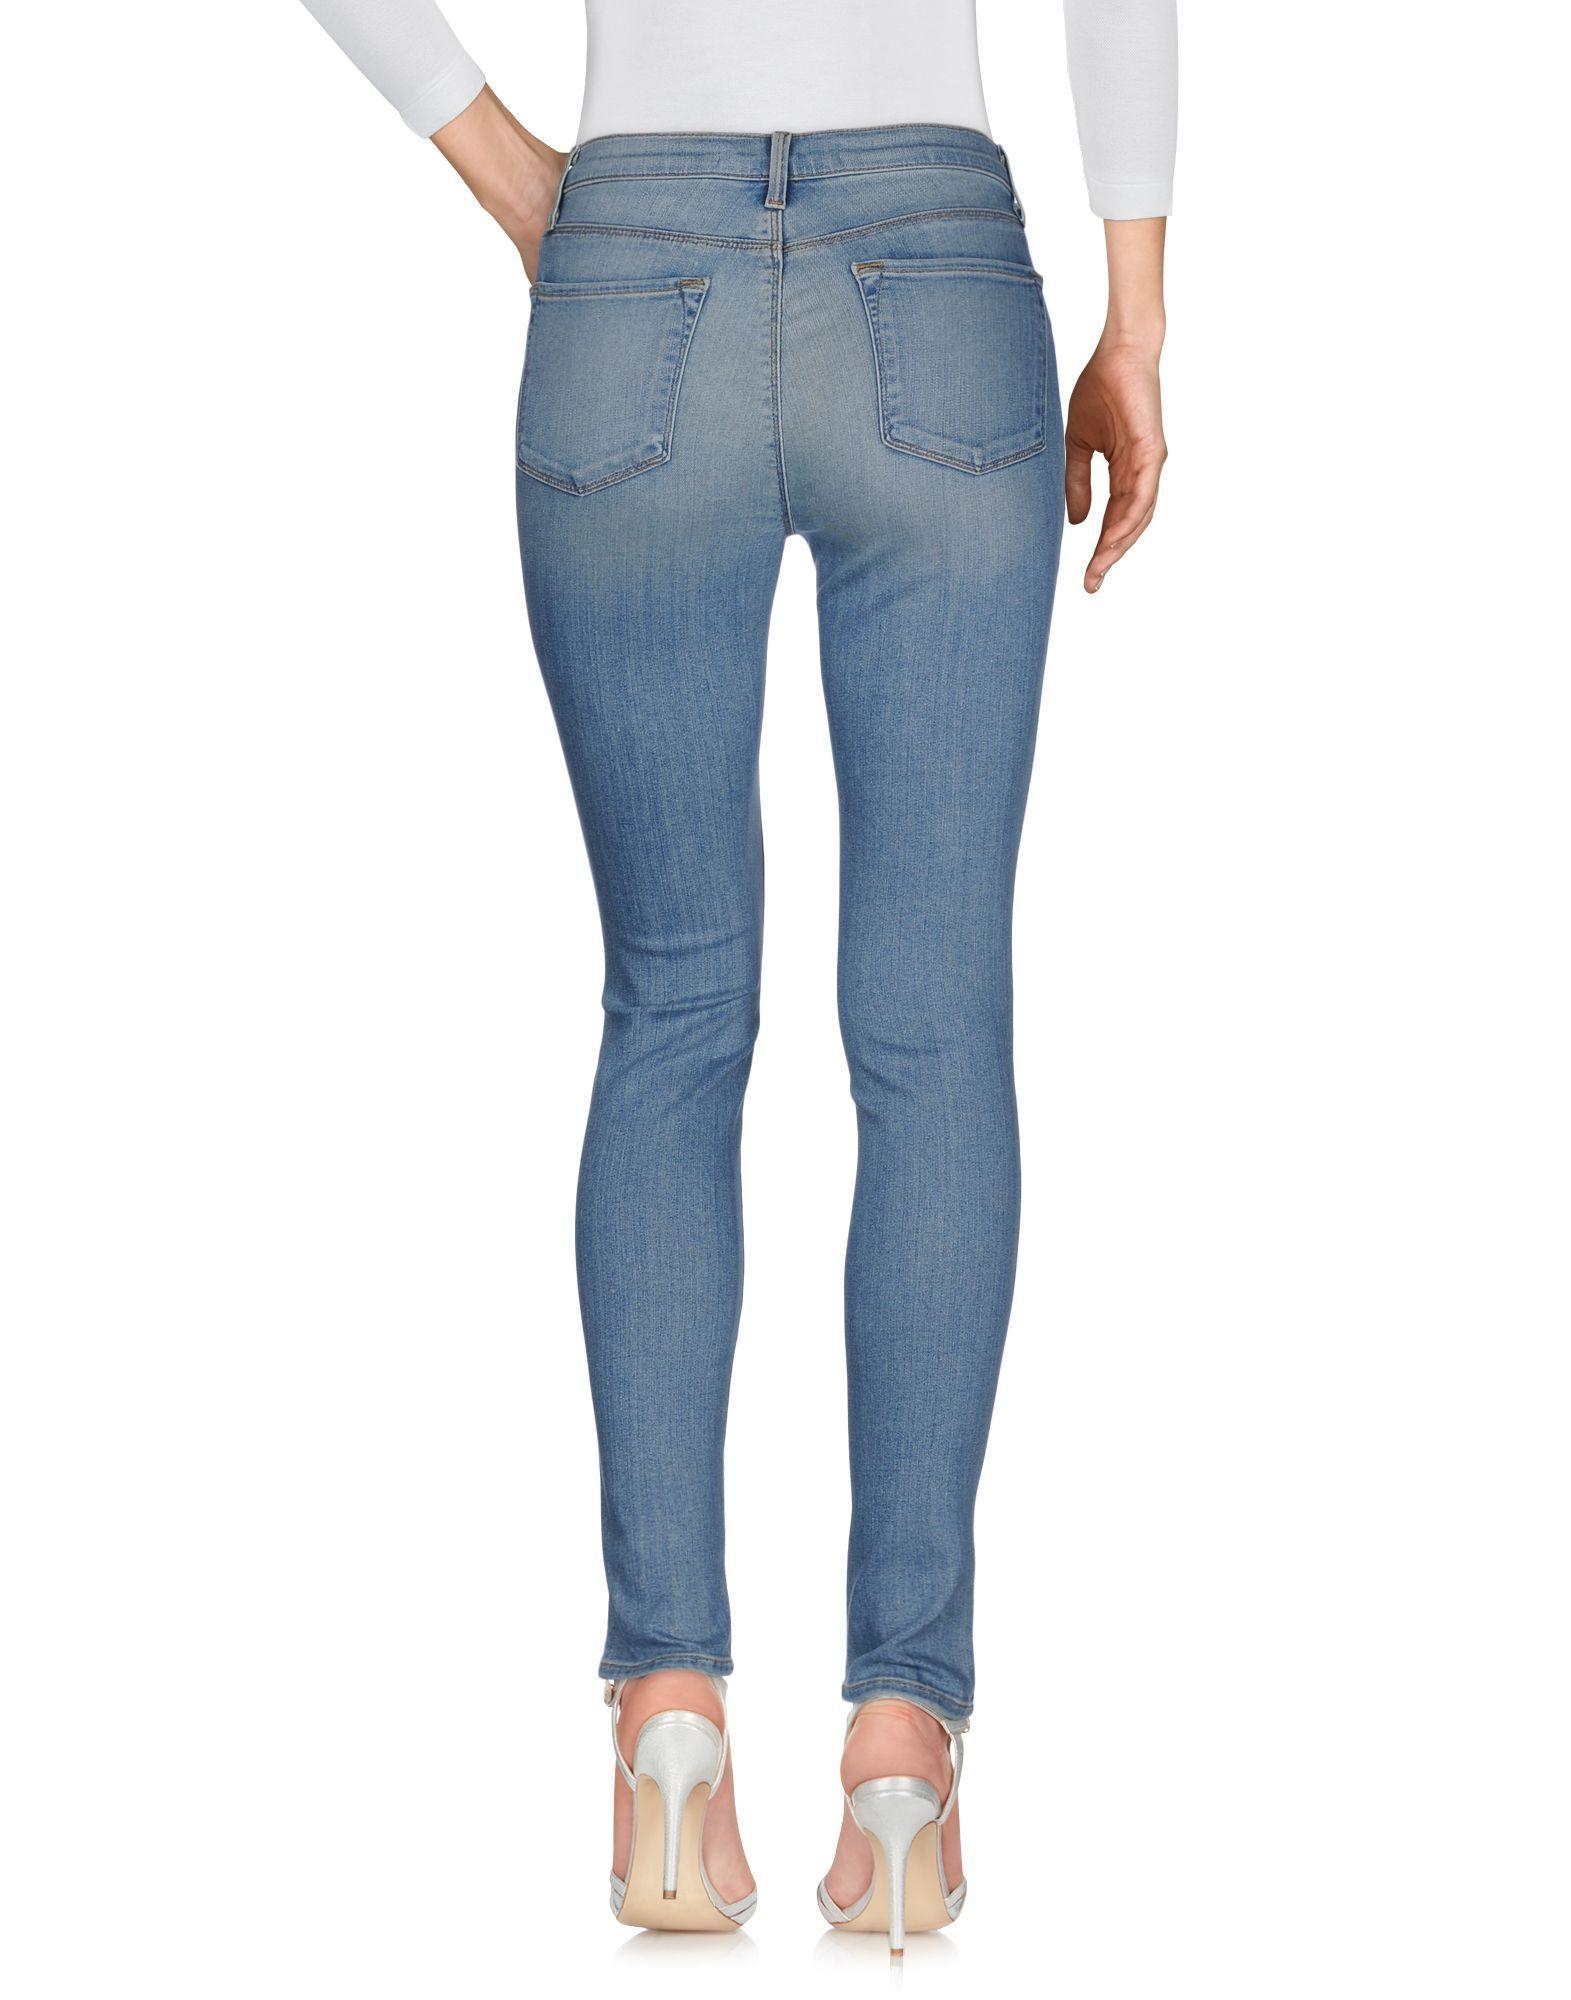 J Brand Blue Skinny Jeans